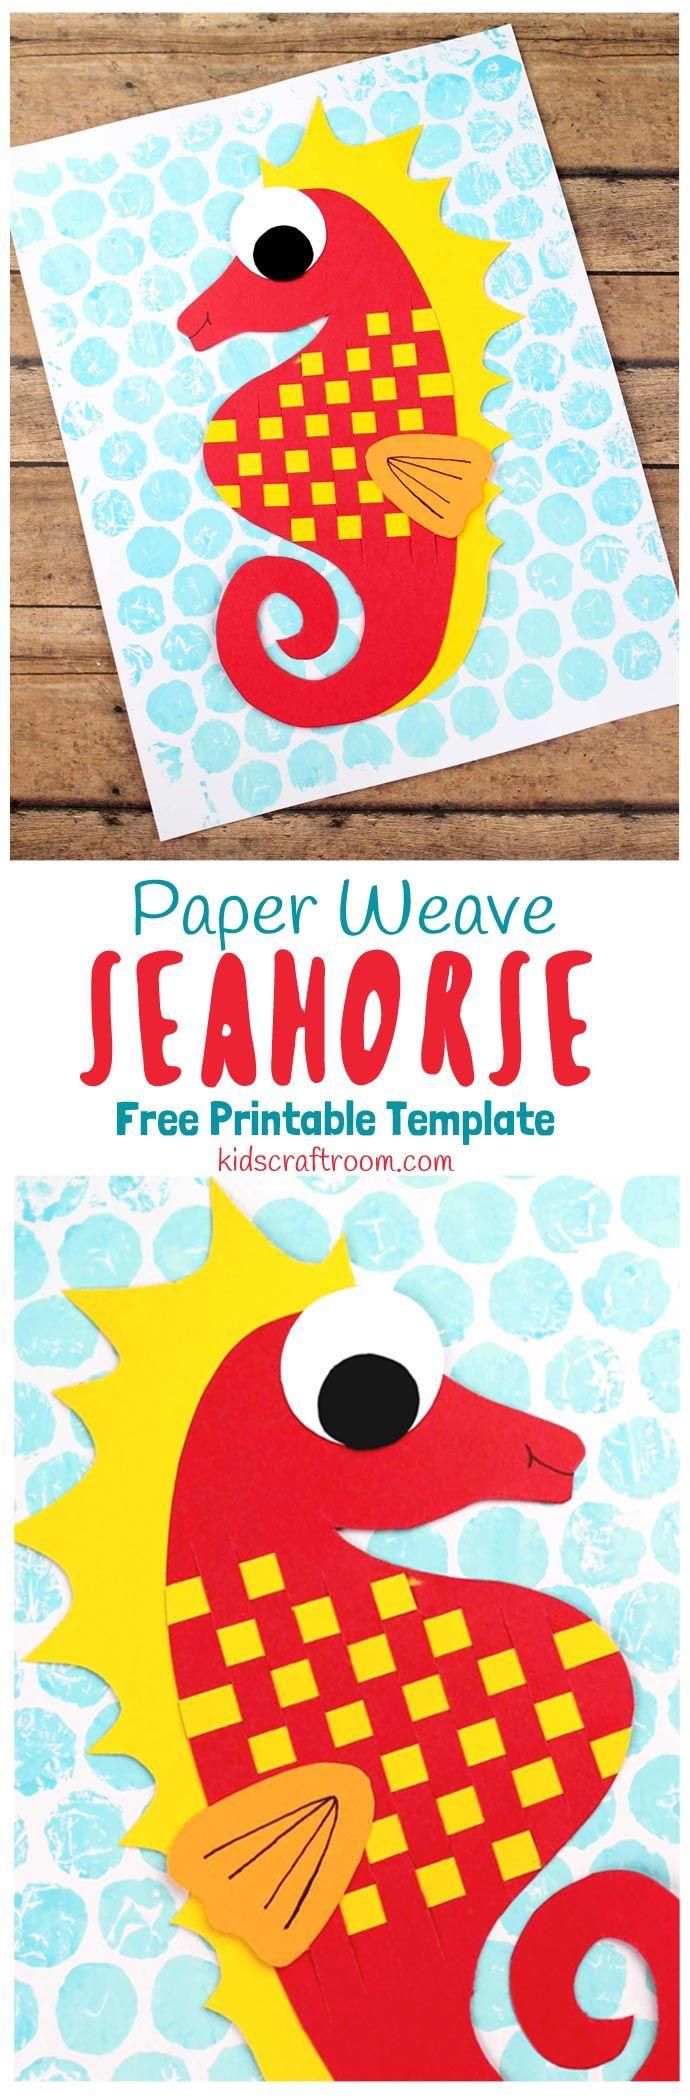 Paper Weaving Seahorse Craft Kids Craft Room Pinterest